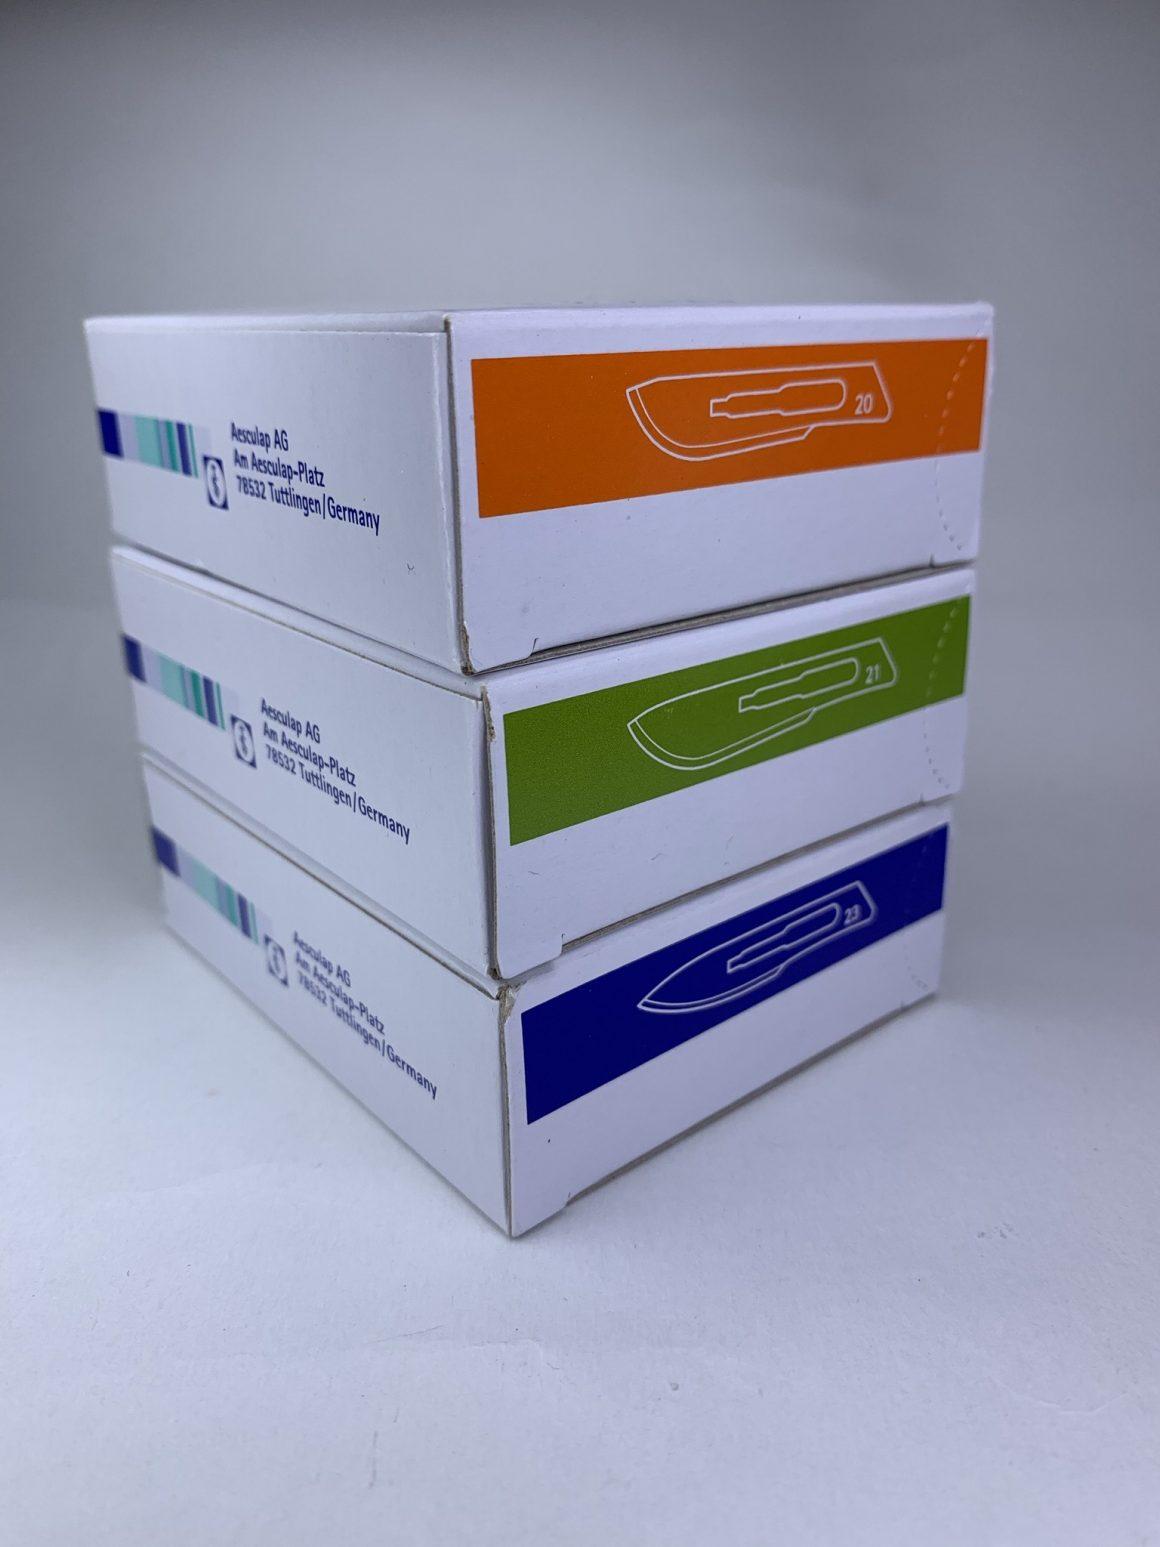 Braun szike 1 doboz 100db